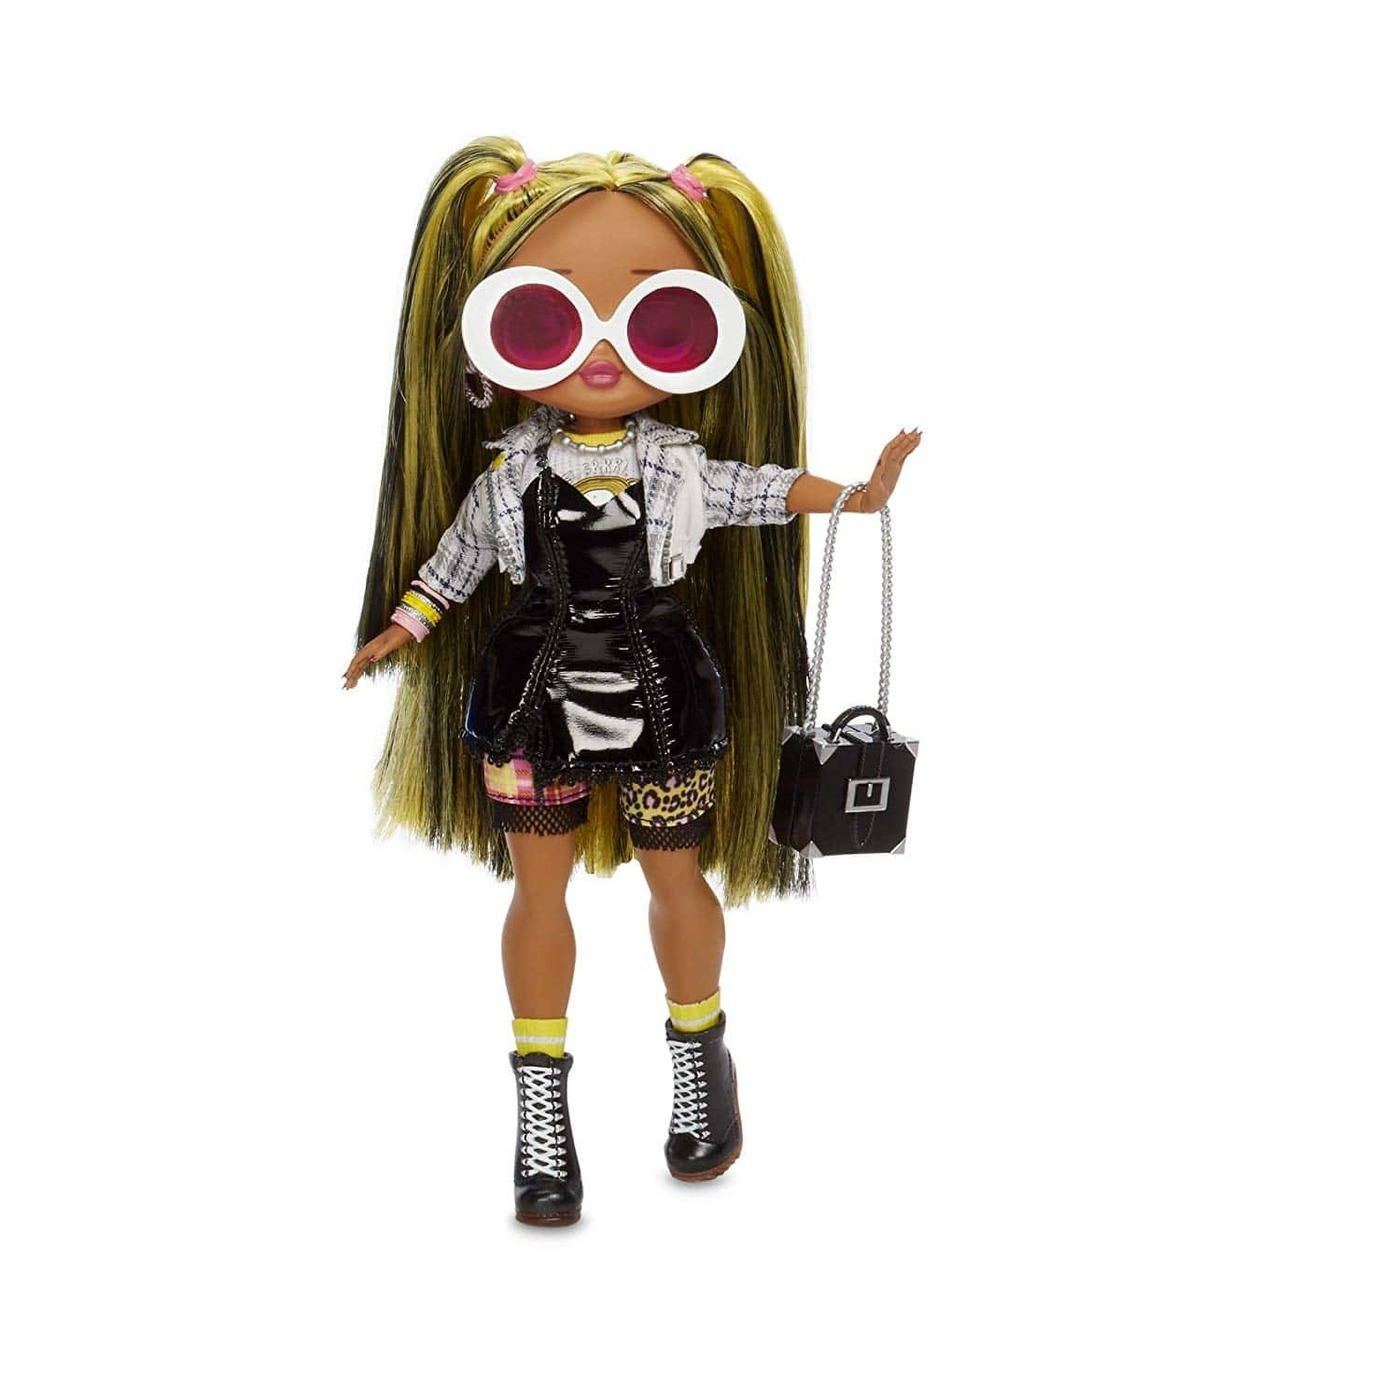 L.O.L. Surprise Кукла ЛОЛ OMG Alt Grrrl (2 волна)